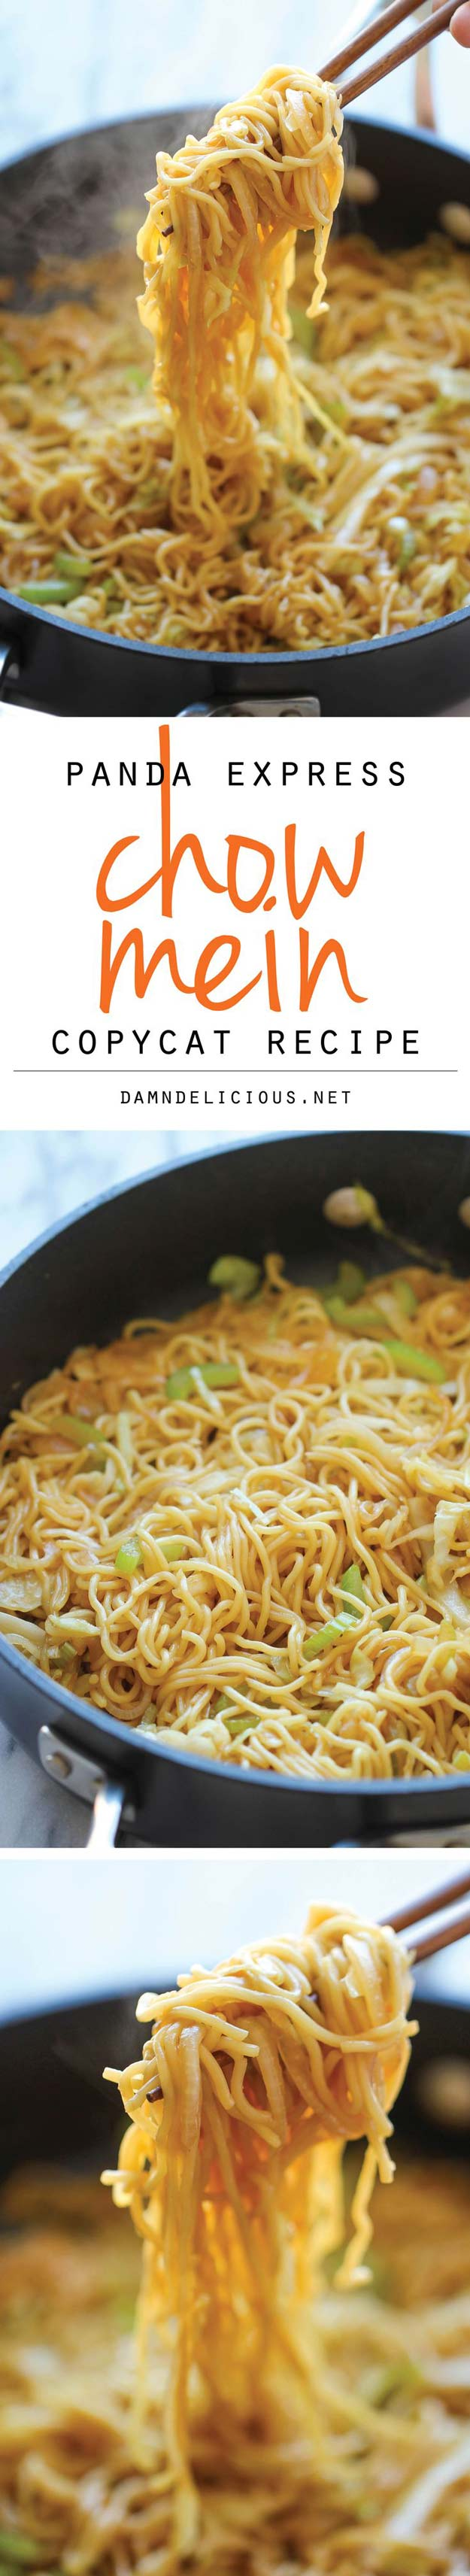 Copycat Recipes From Top Restaurants. Best Recipe Knockoffs from Chipotle, Starbucks, Olive Garden, Cinabbon, Cracker Barrel, Taco Bell, Cheesecake Factory, KFC, Mc Donalds, Red Lobster, Panda Express   Panda Express Chow Mein Copycat   http://diyjoy.com/copycat-recipes